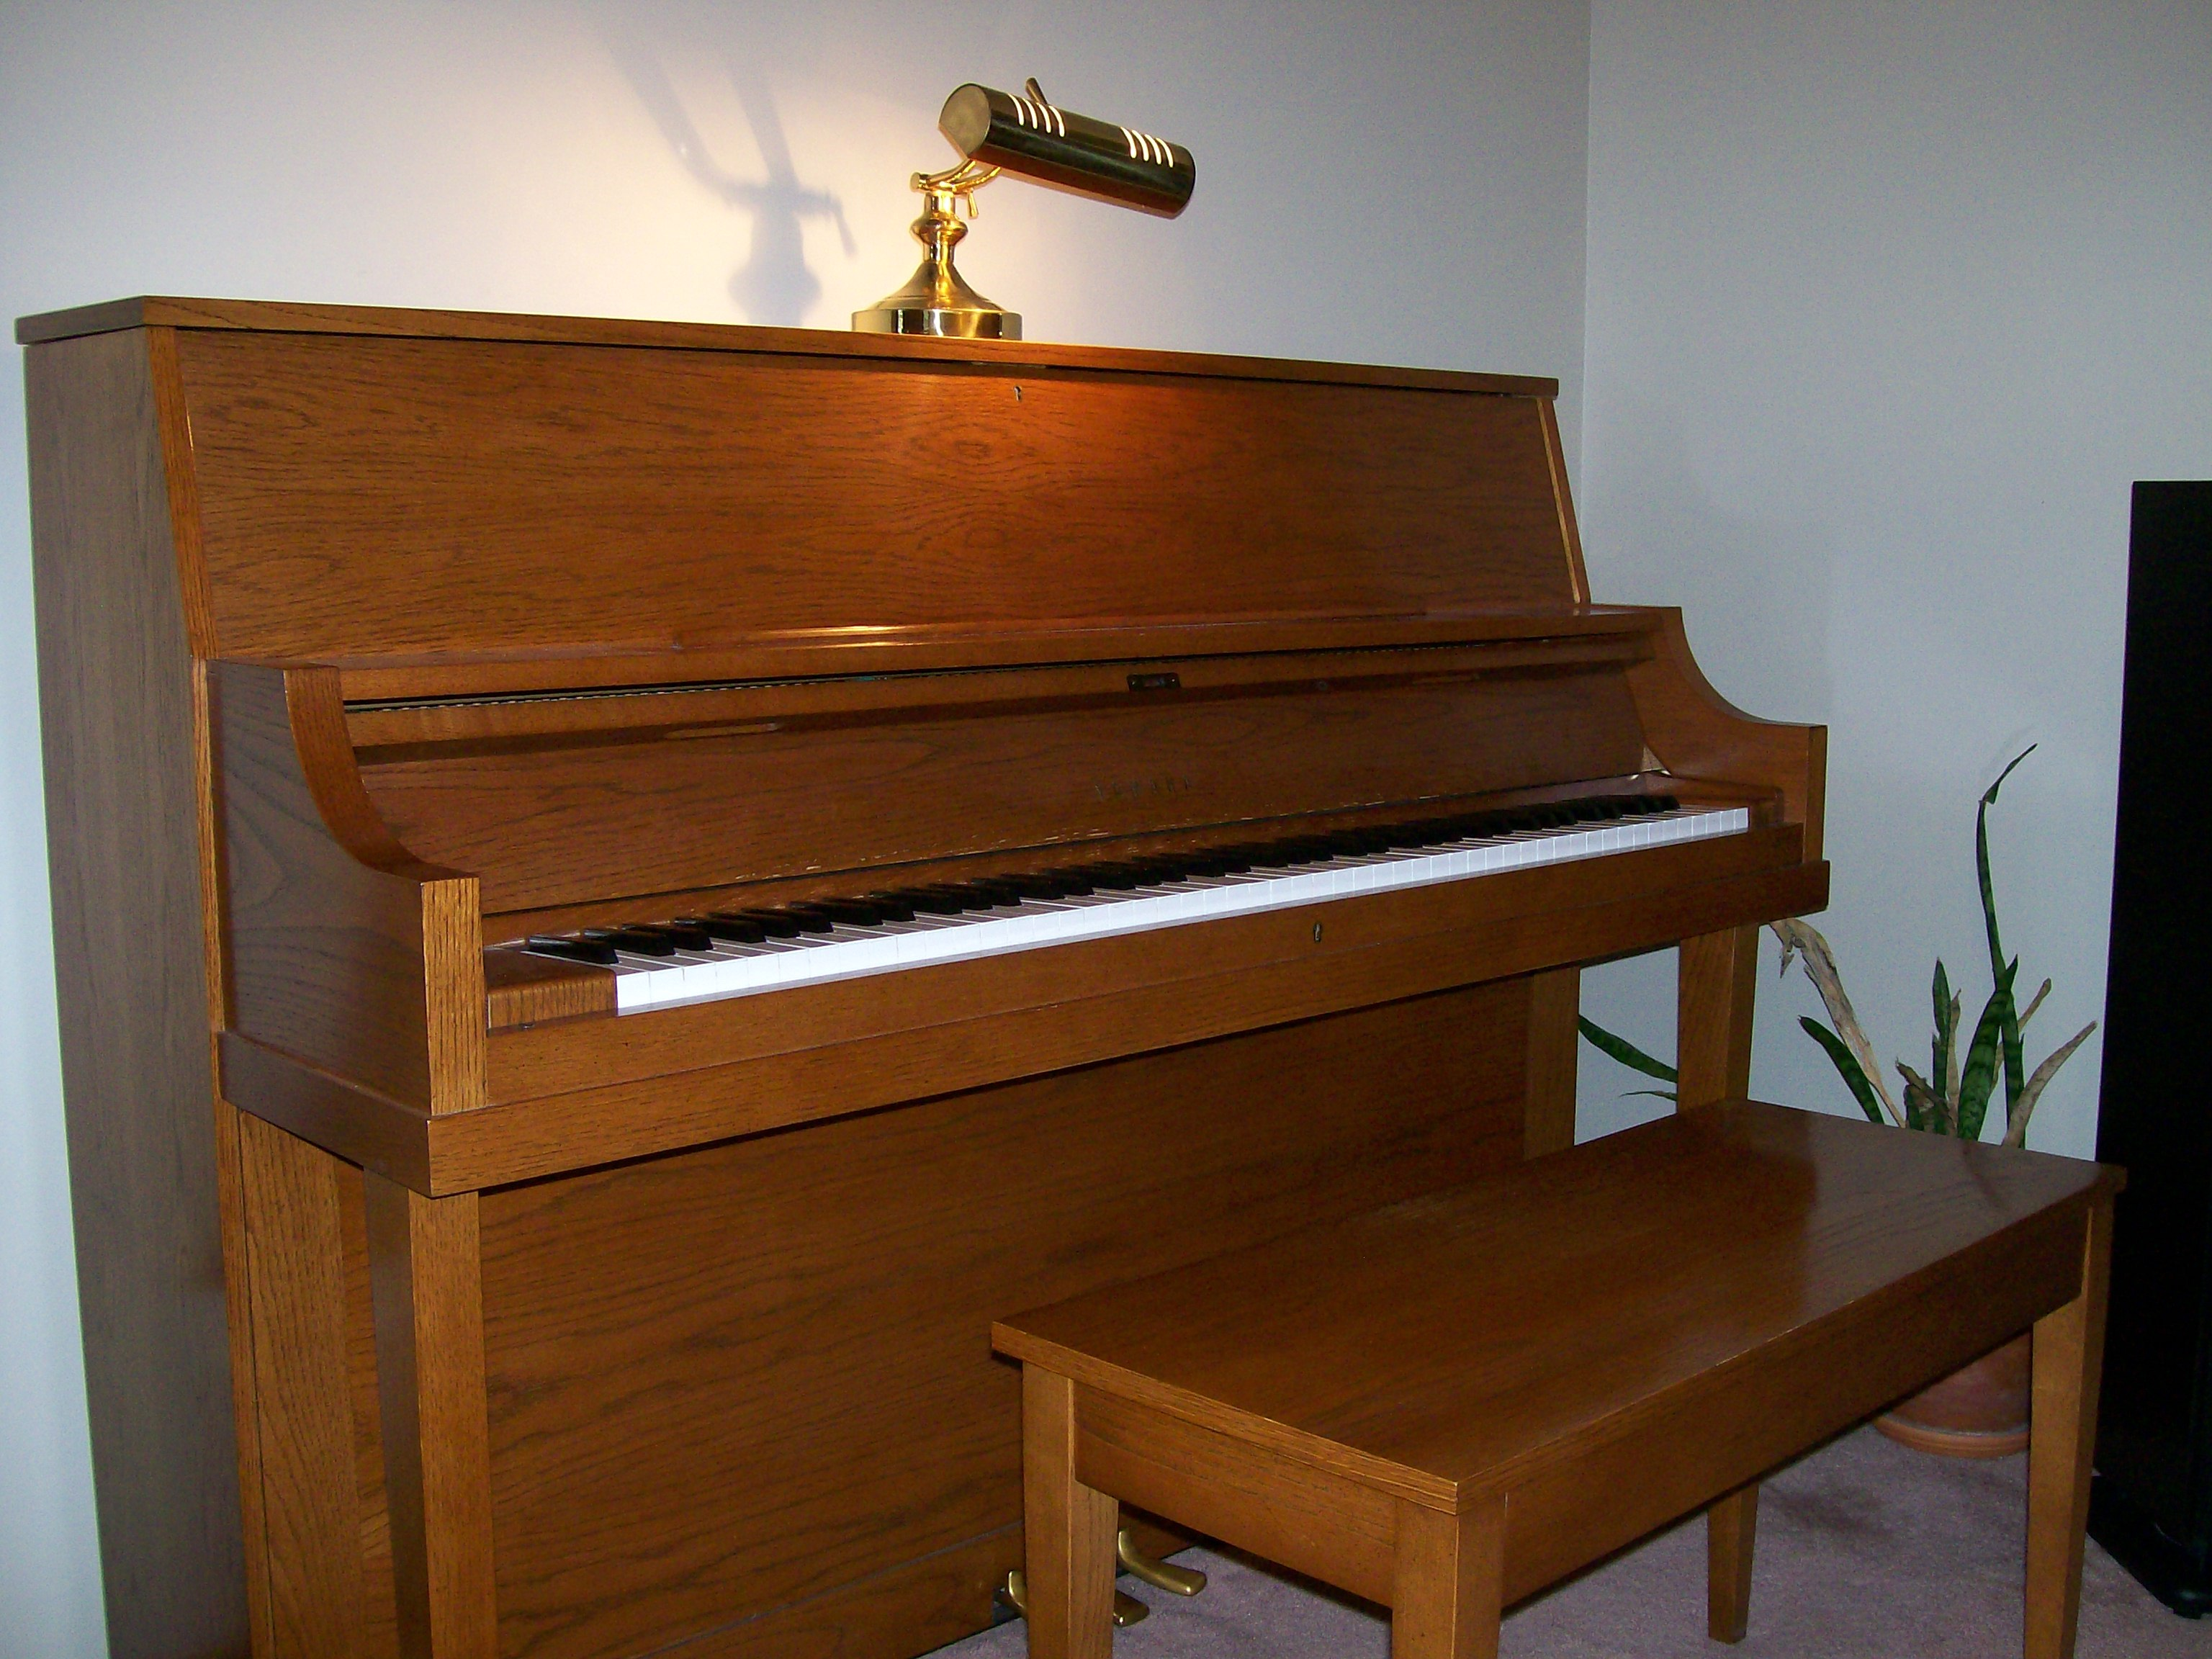 file yamaha p22 piano kansas city. Black Bedroom Furniture Sets. Home Design Ideas